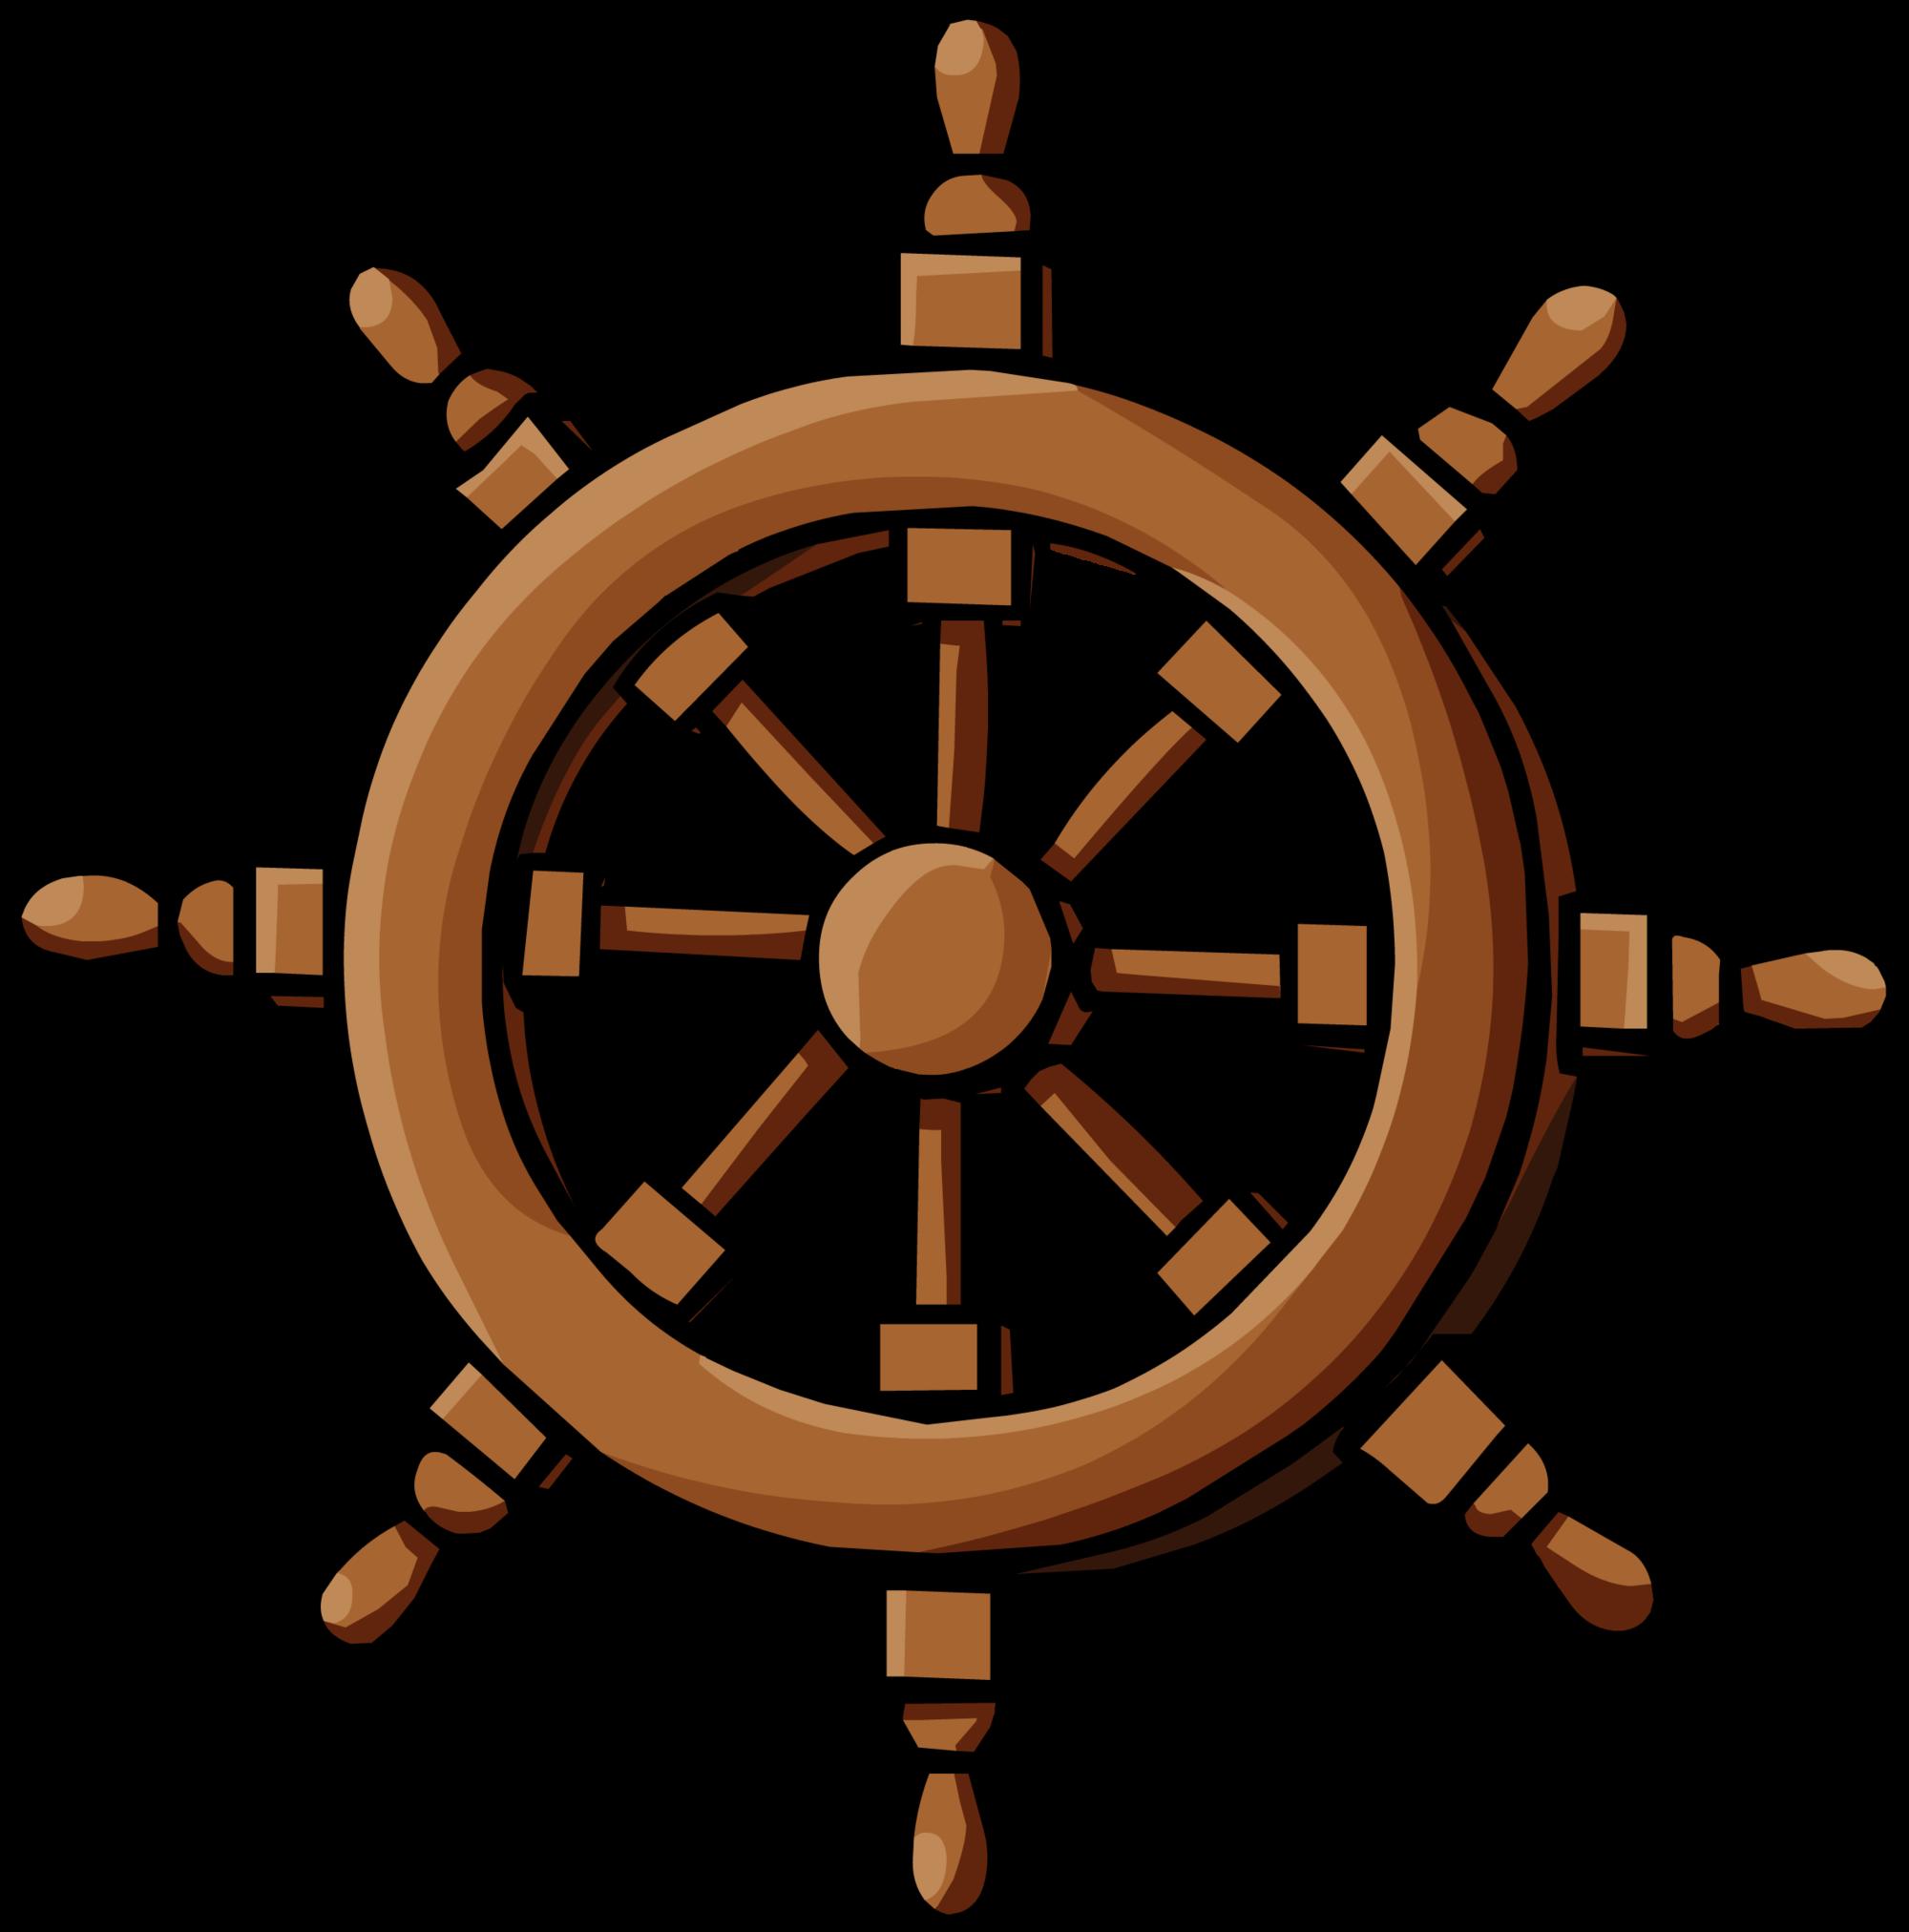 jpg free Captains wheel clipart. Image captain s sprite